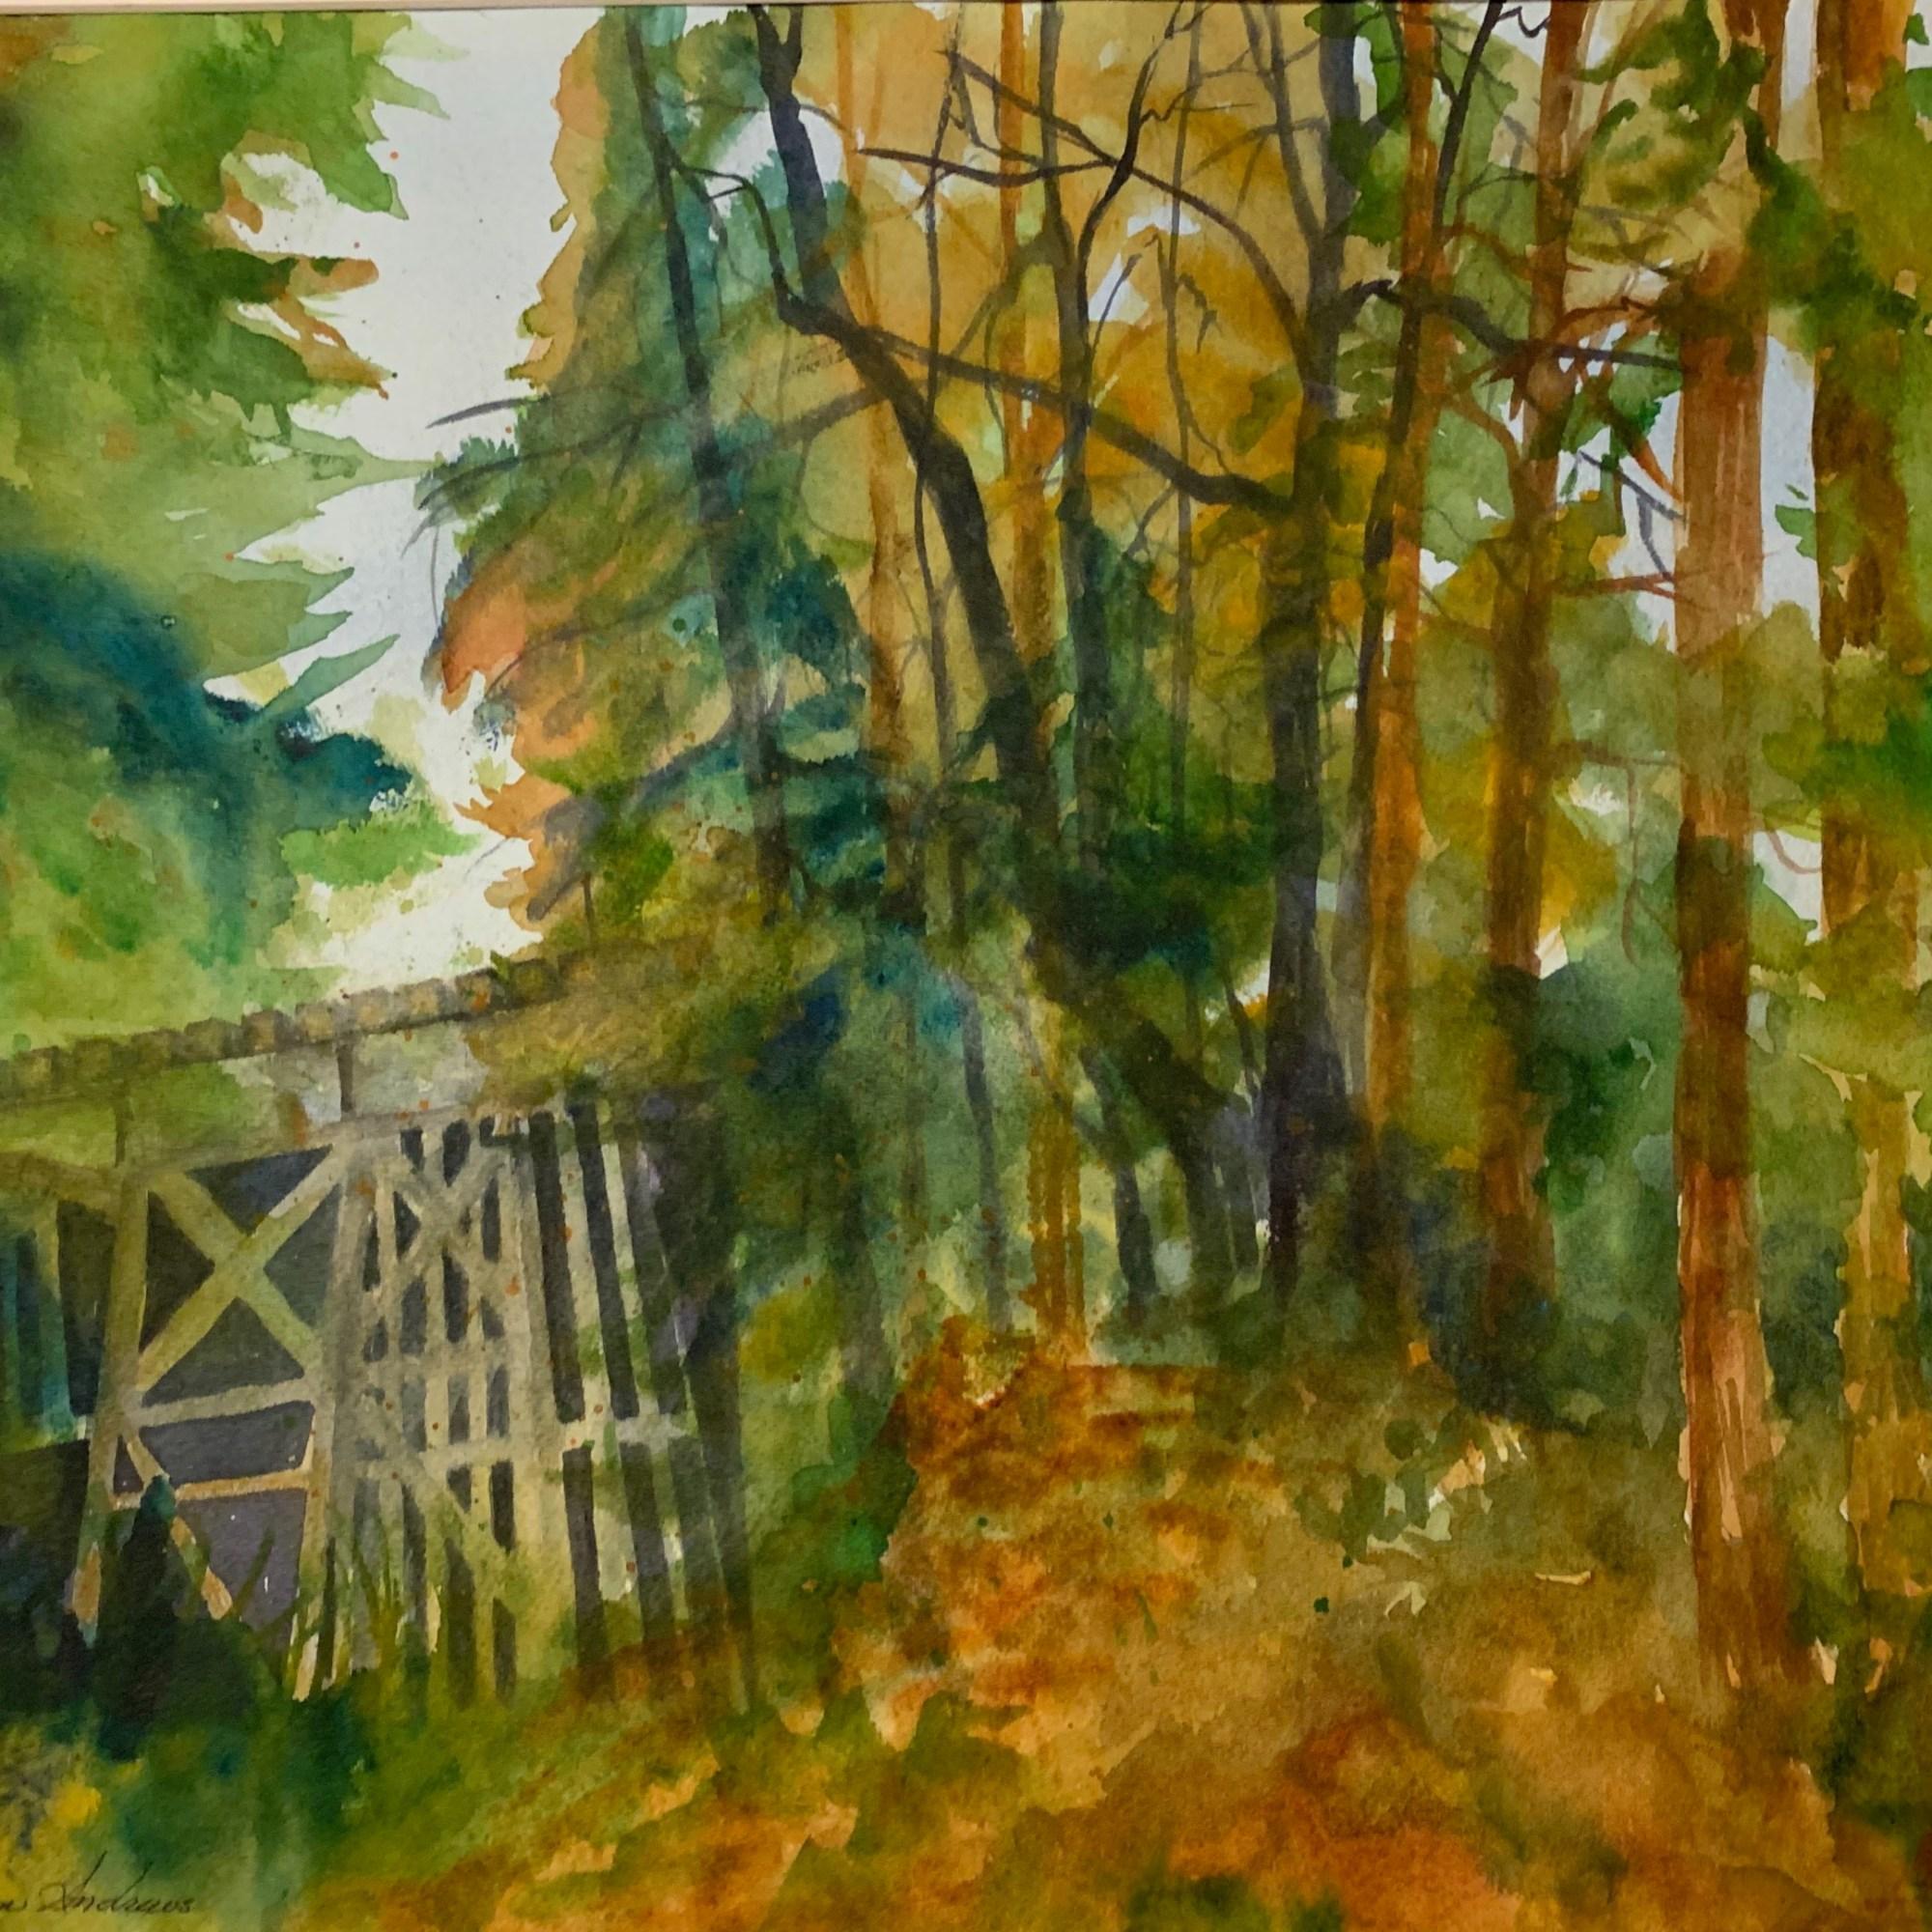 Railroad Bridge Hwy 9, Felton - Alisan Andrews